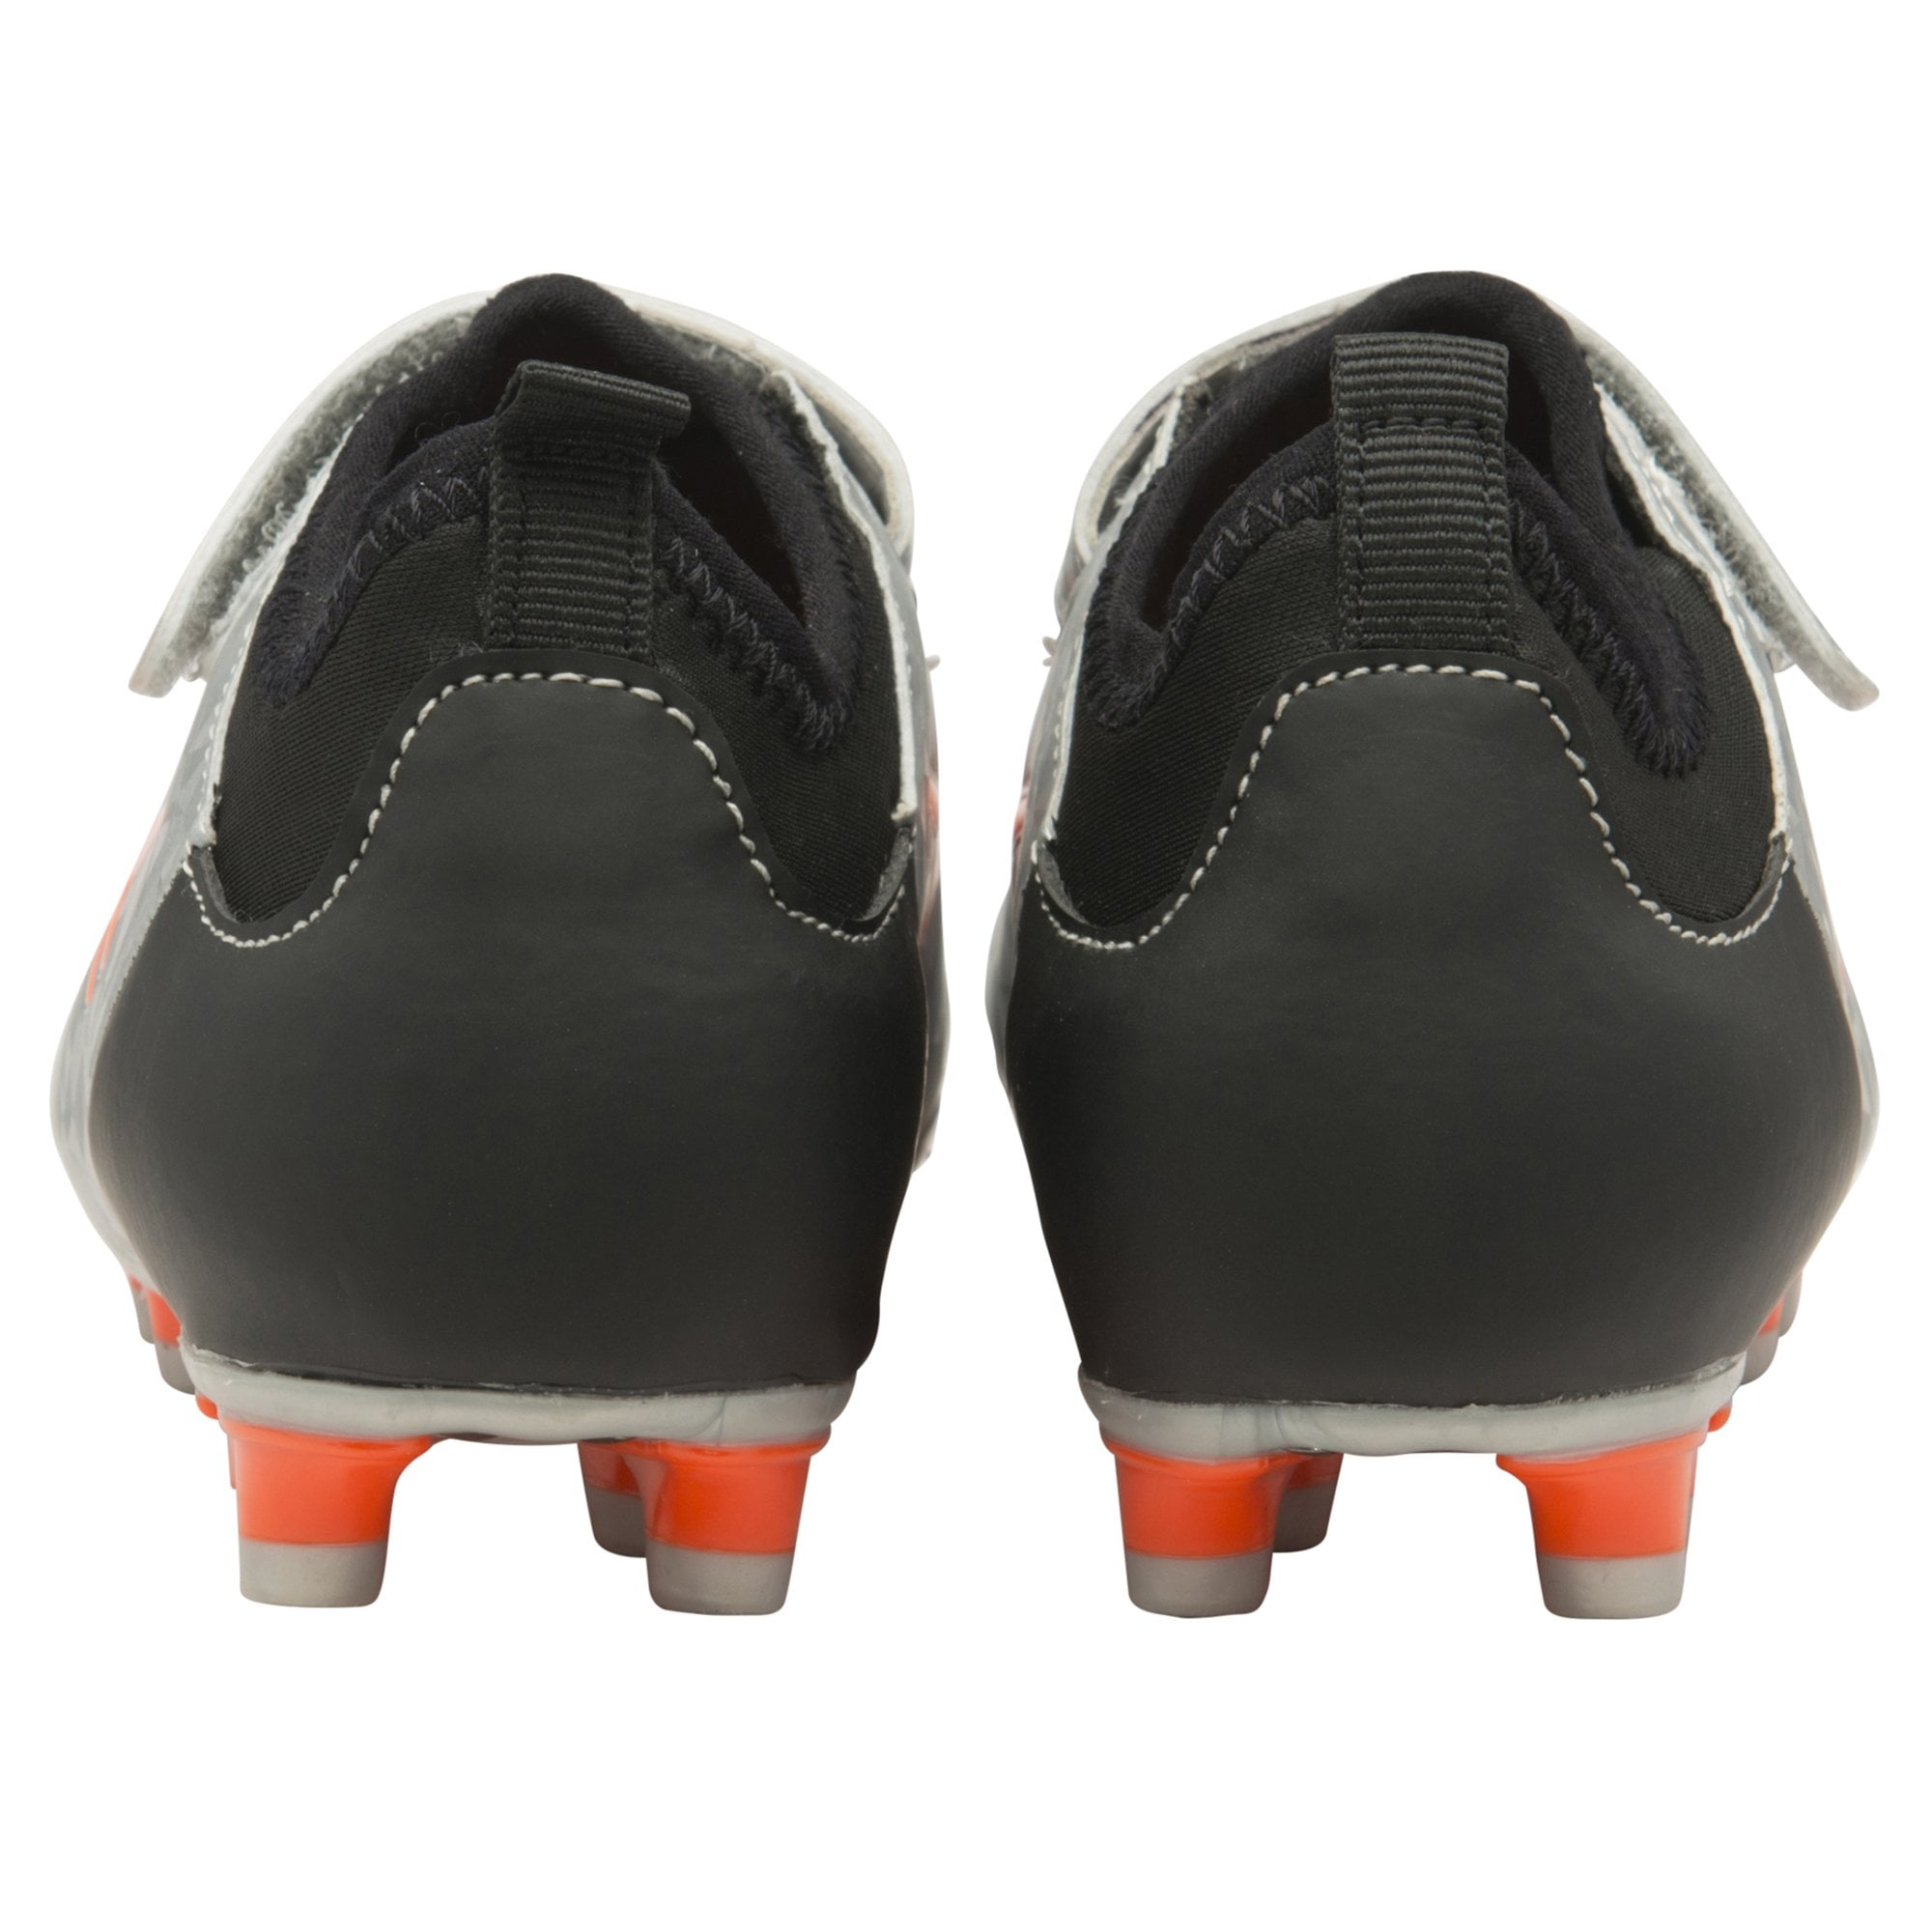 Gola Alpha Infants MLD Football Boots in Silver /& Orange